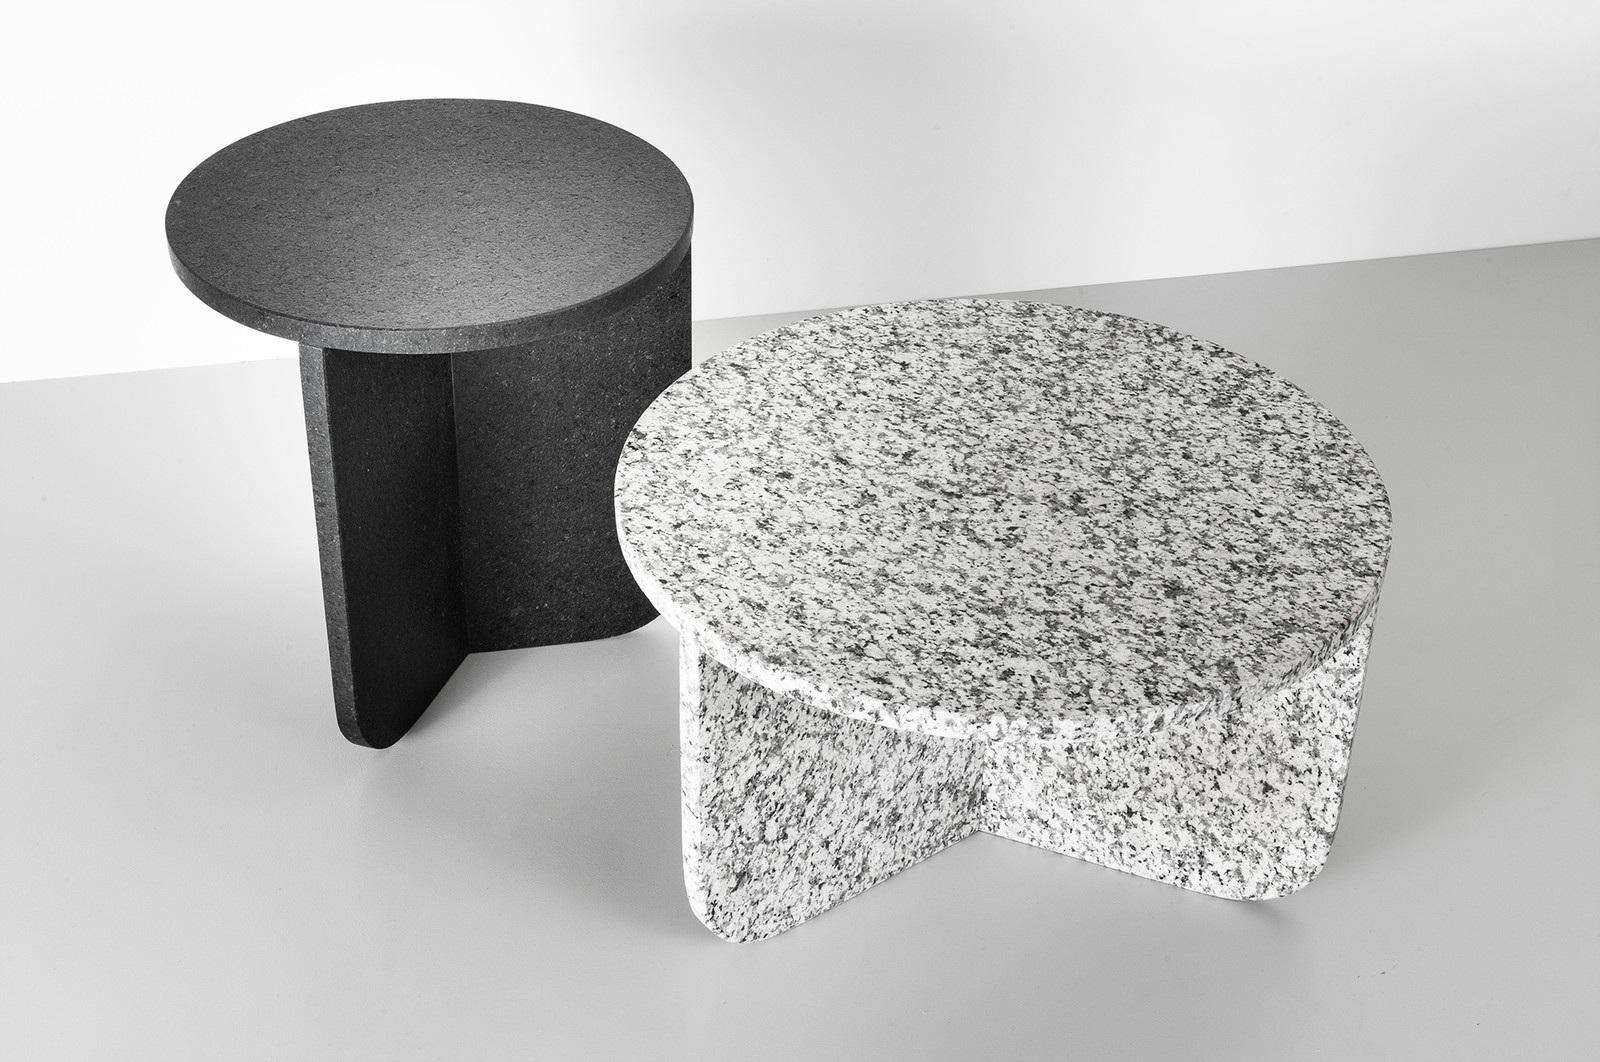 Leme / Rain, side table (40x41cm) and coffee table (55x31cm), marble